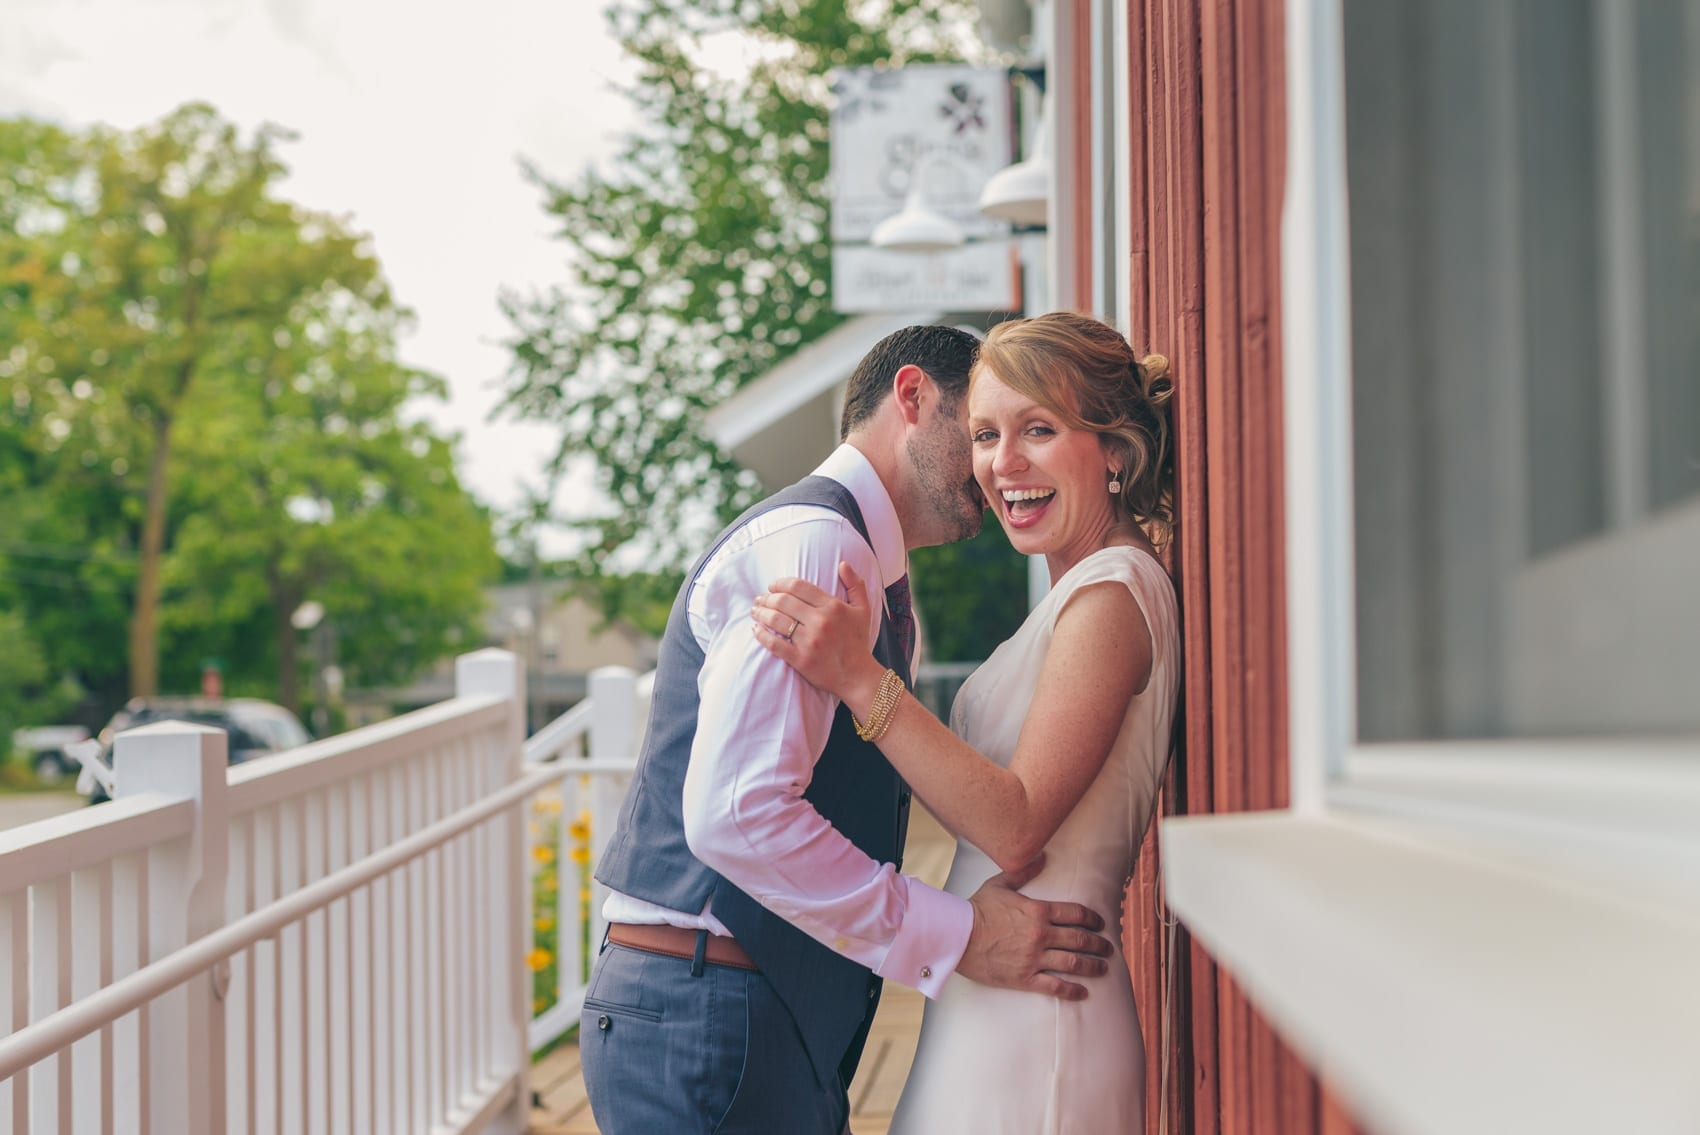 thara photo wedding photographer chicago elkhart lake Wisconsin